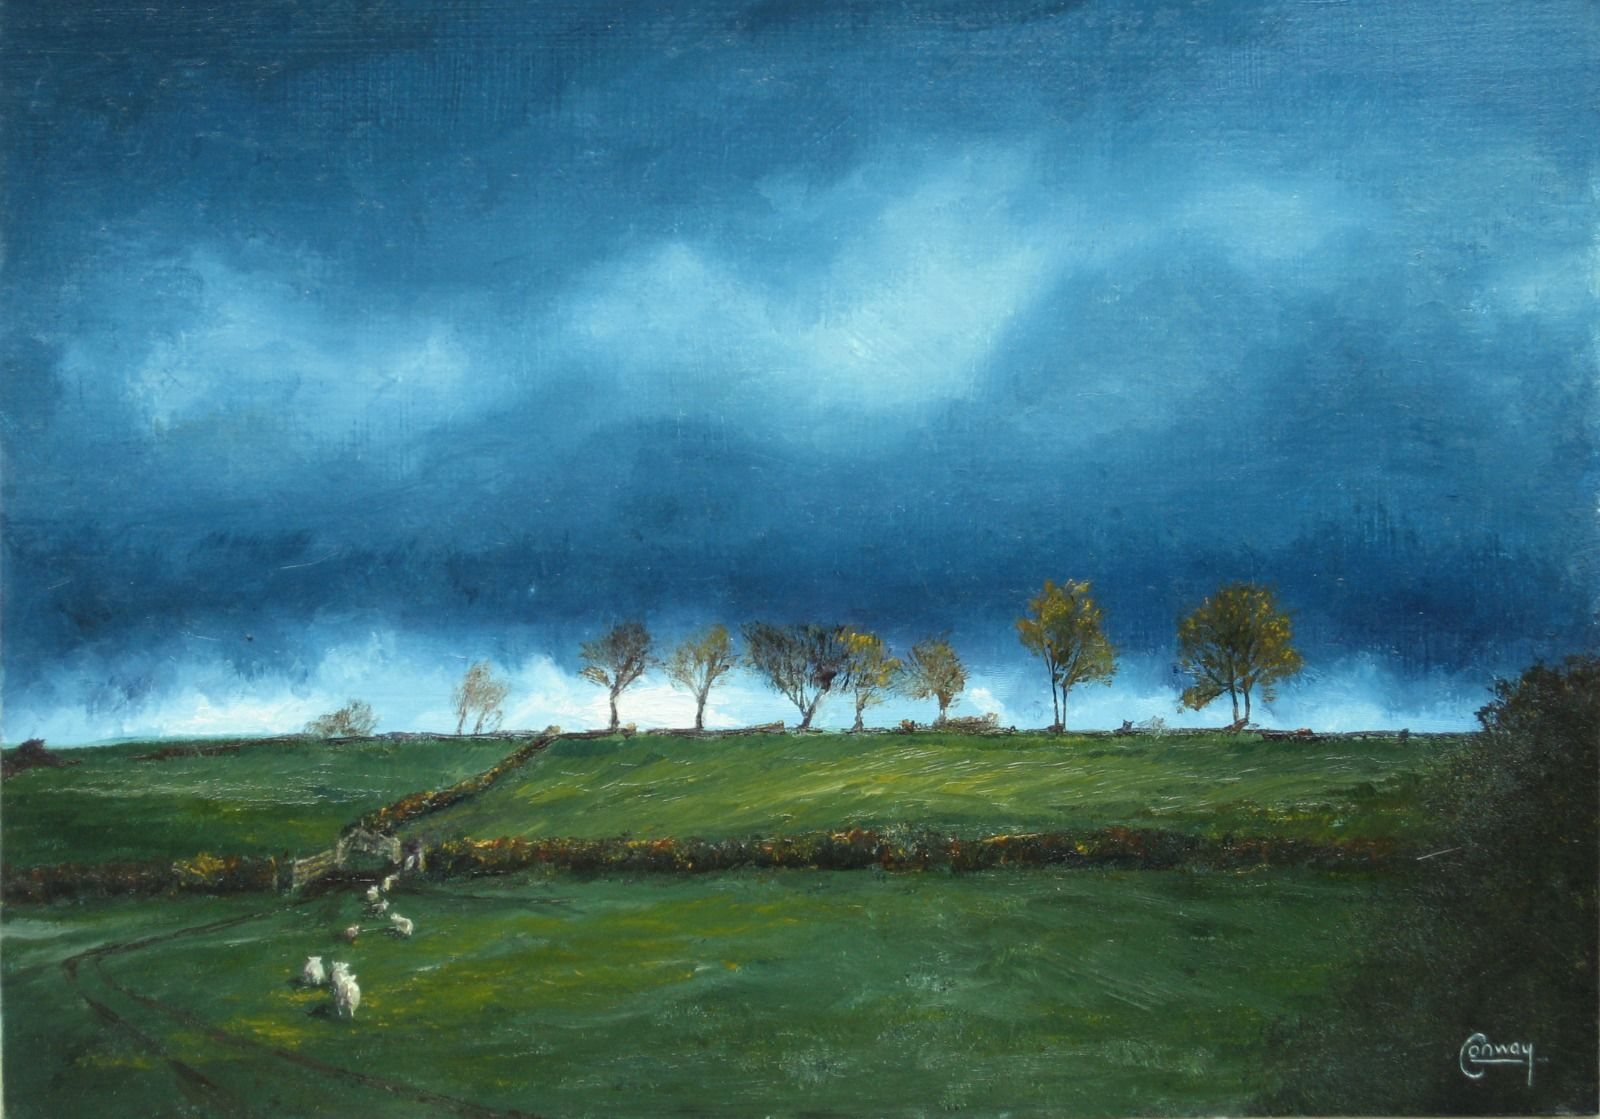 'Sky and Sheep Looking North' - Llansawel, Carmarthenshire